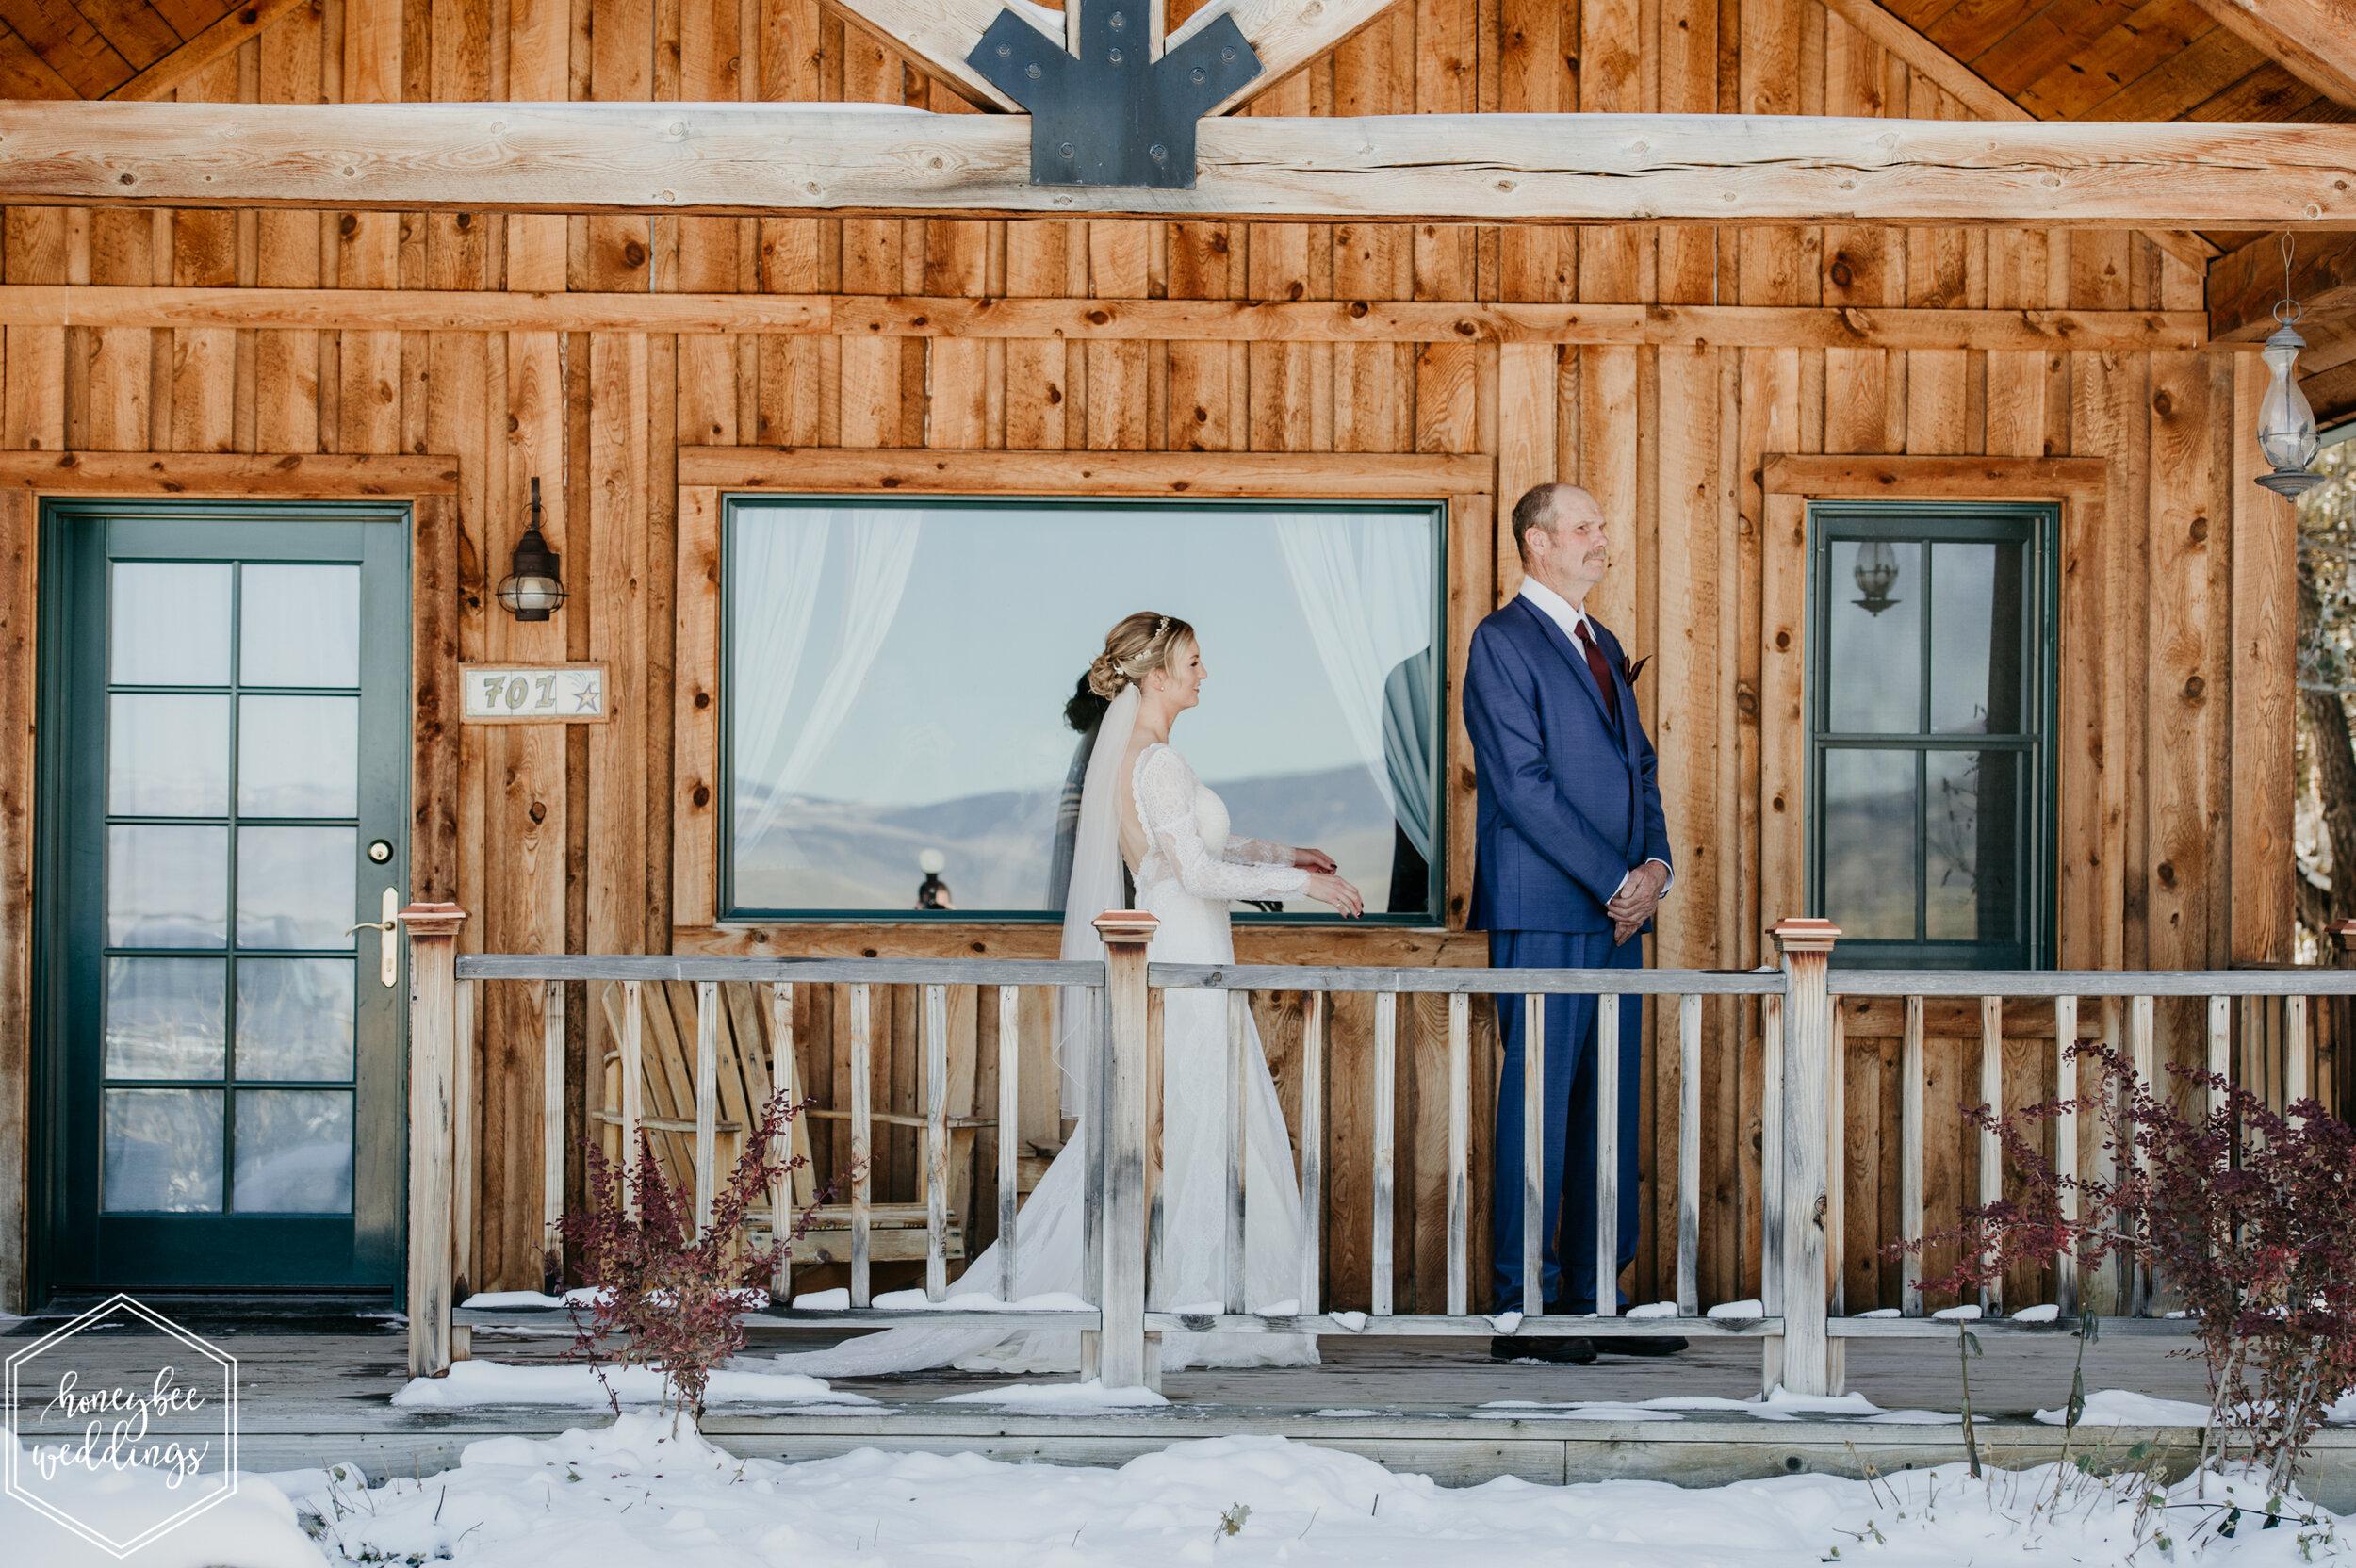 035Chico Hot Springs Wedding_Montana Wedding Photographer_Winter Wedding_Ariel & Richard_October 12, 2019-2026.jpg